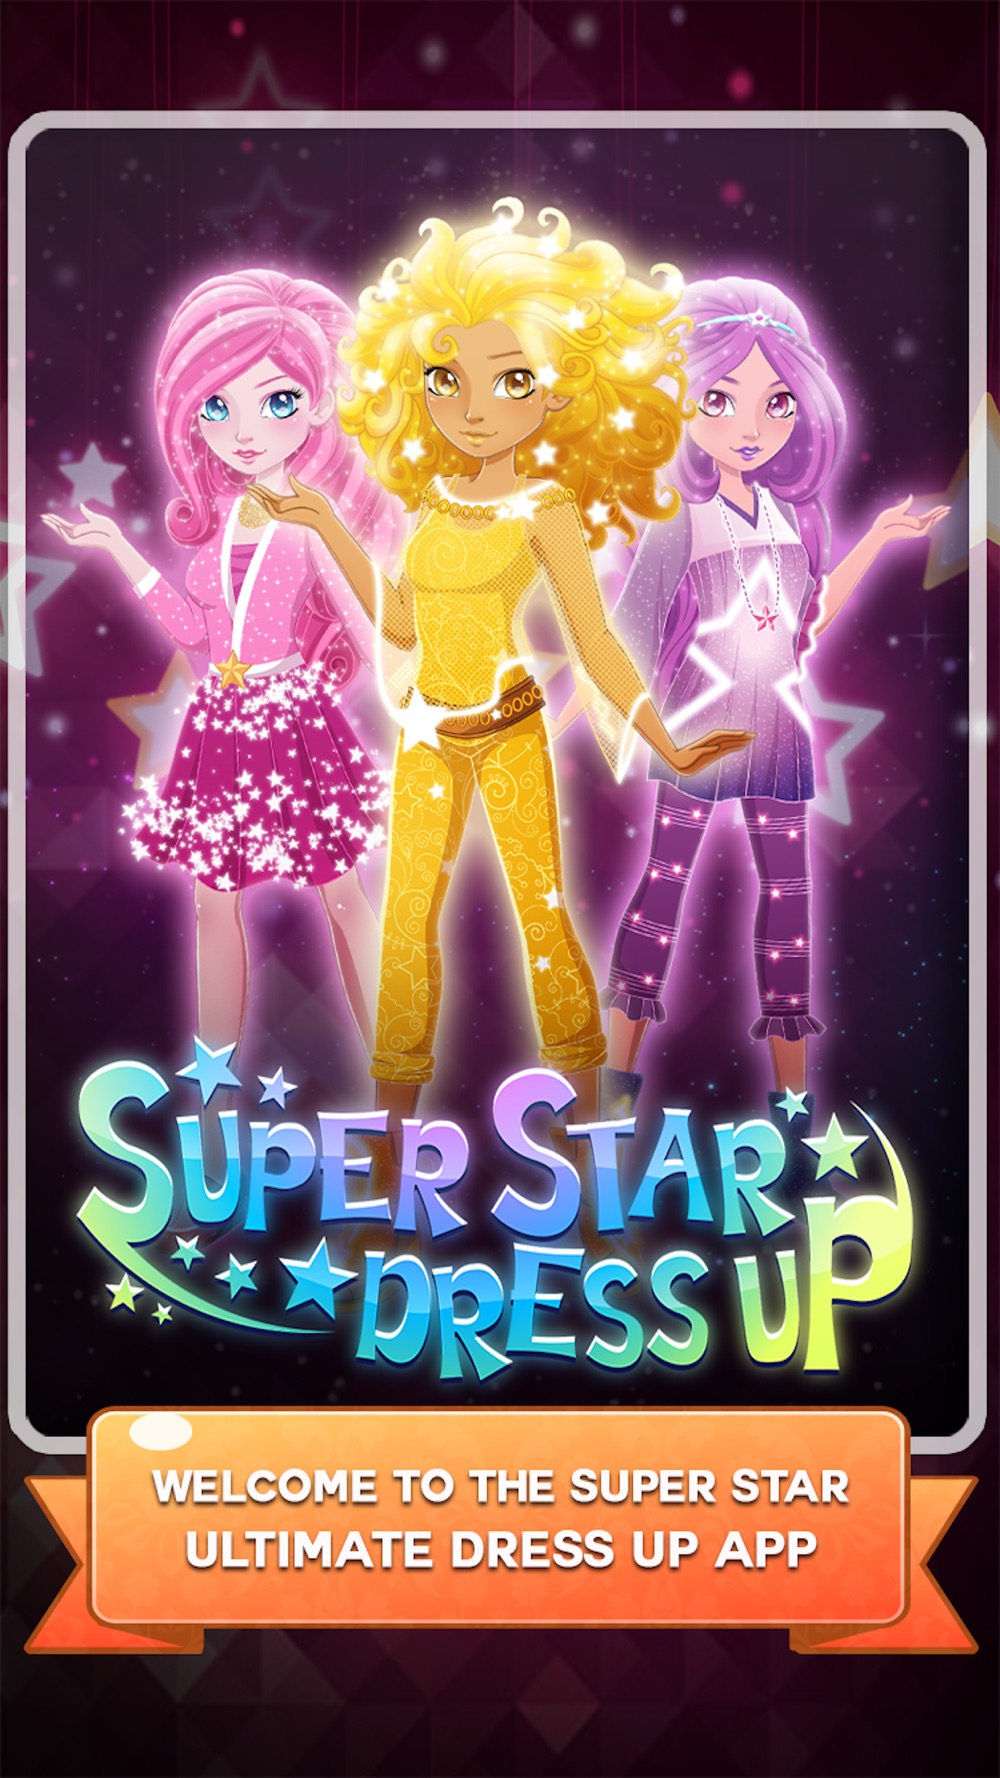 Super-Star Wish Dress-up Darling Princess Teenage Cheat Codes